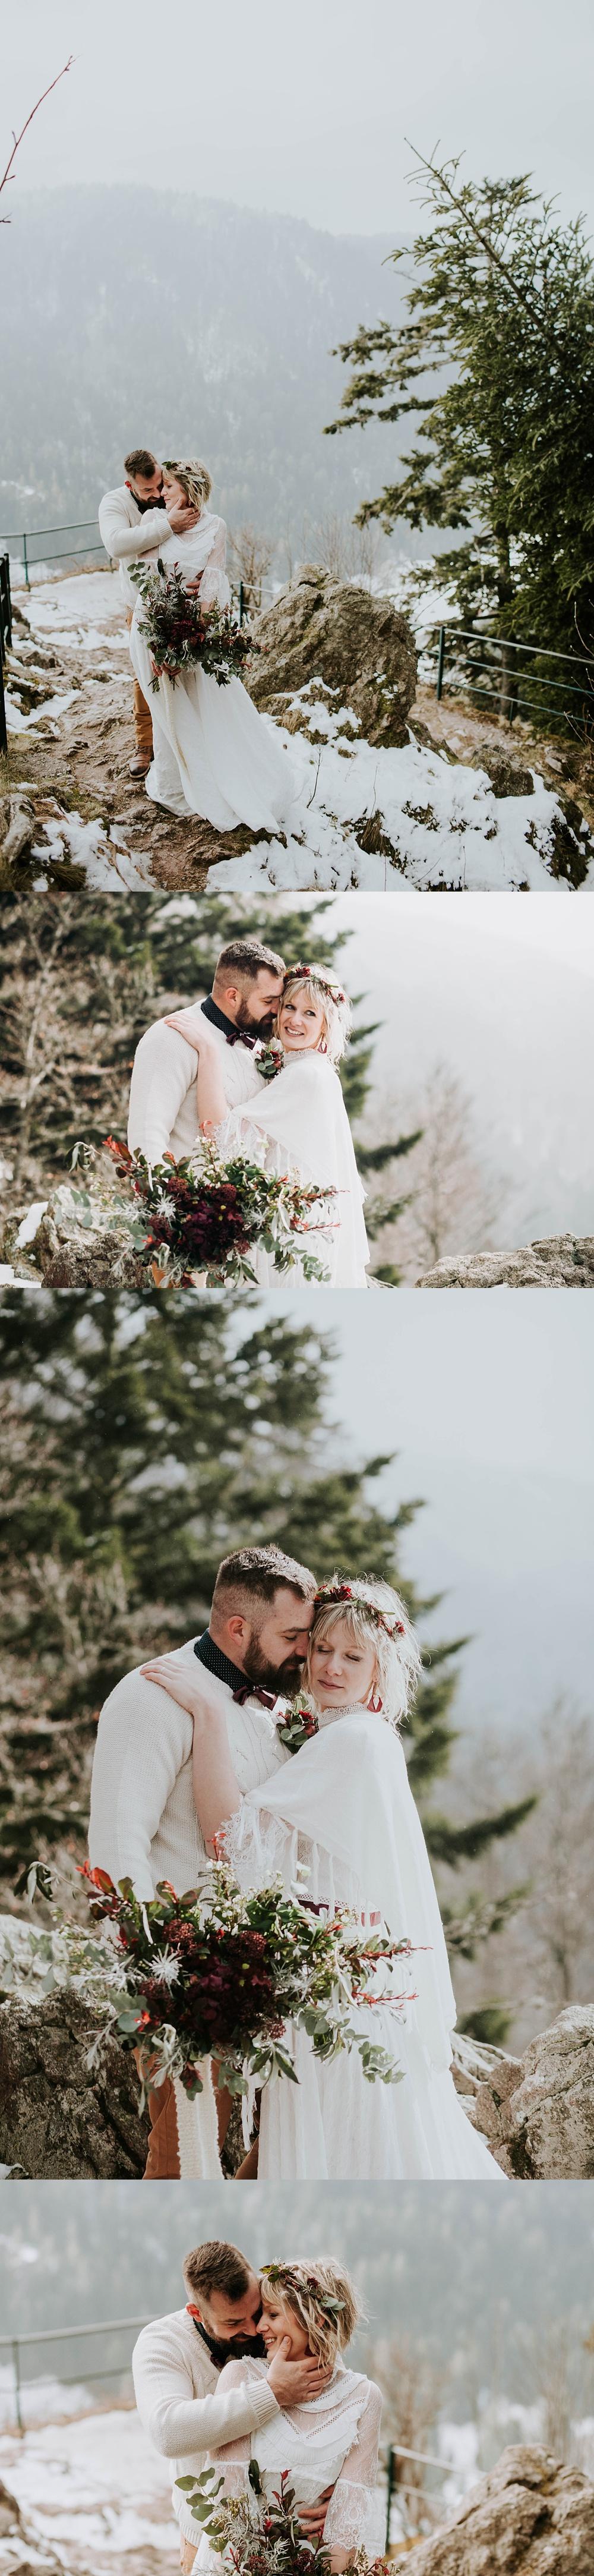 Mariage en hiver dans la neige